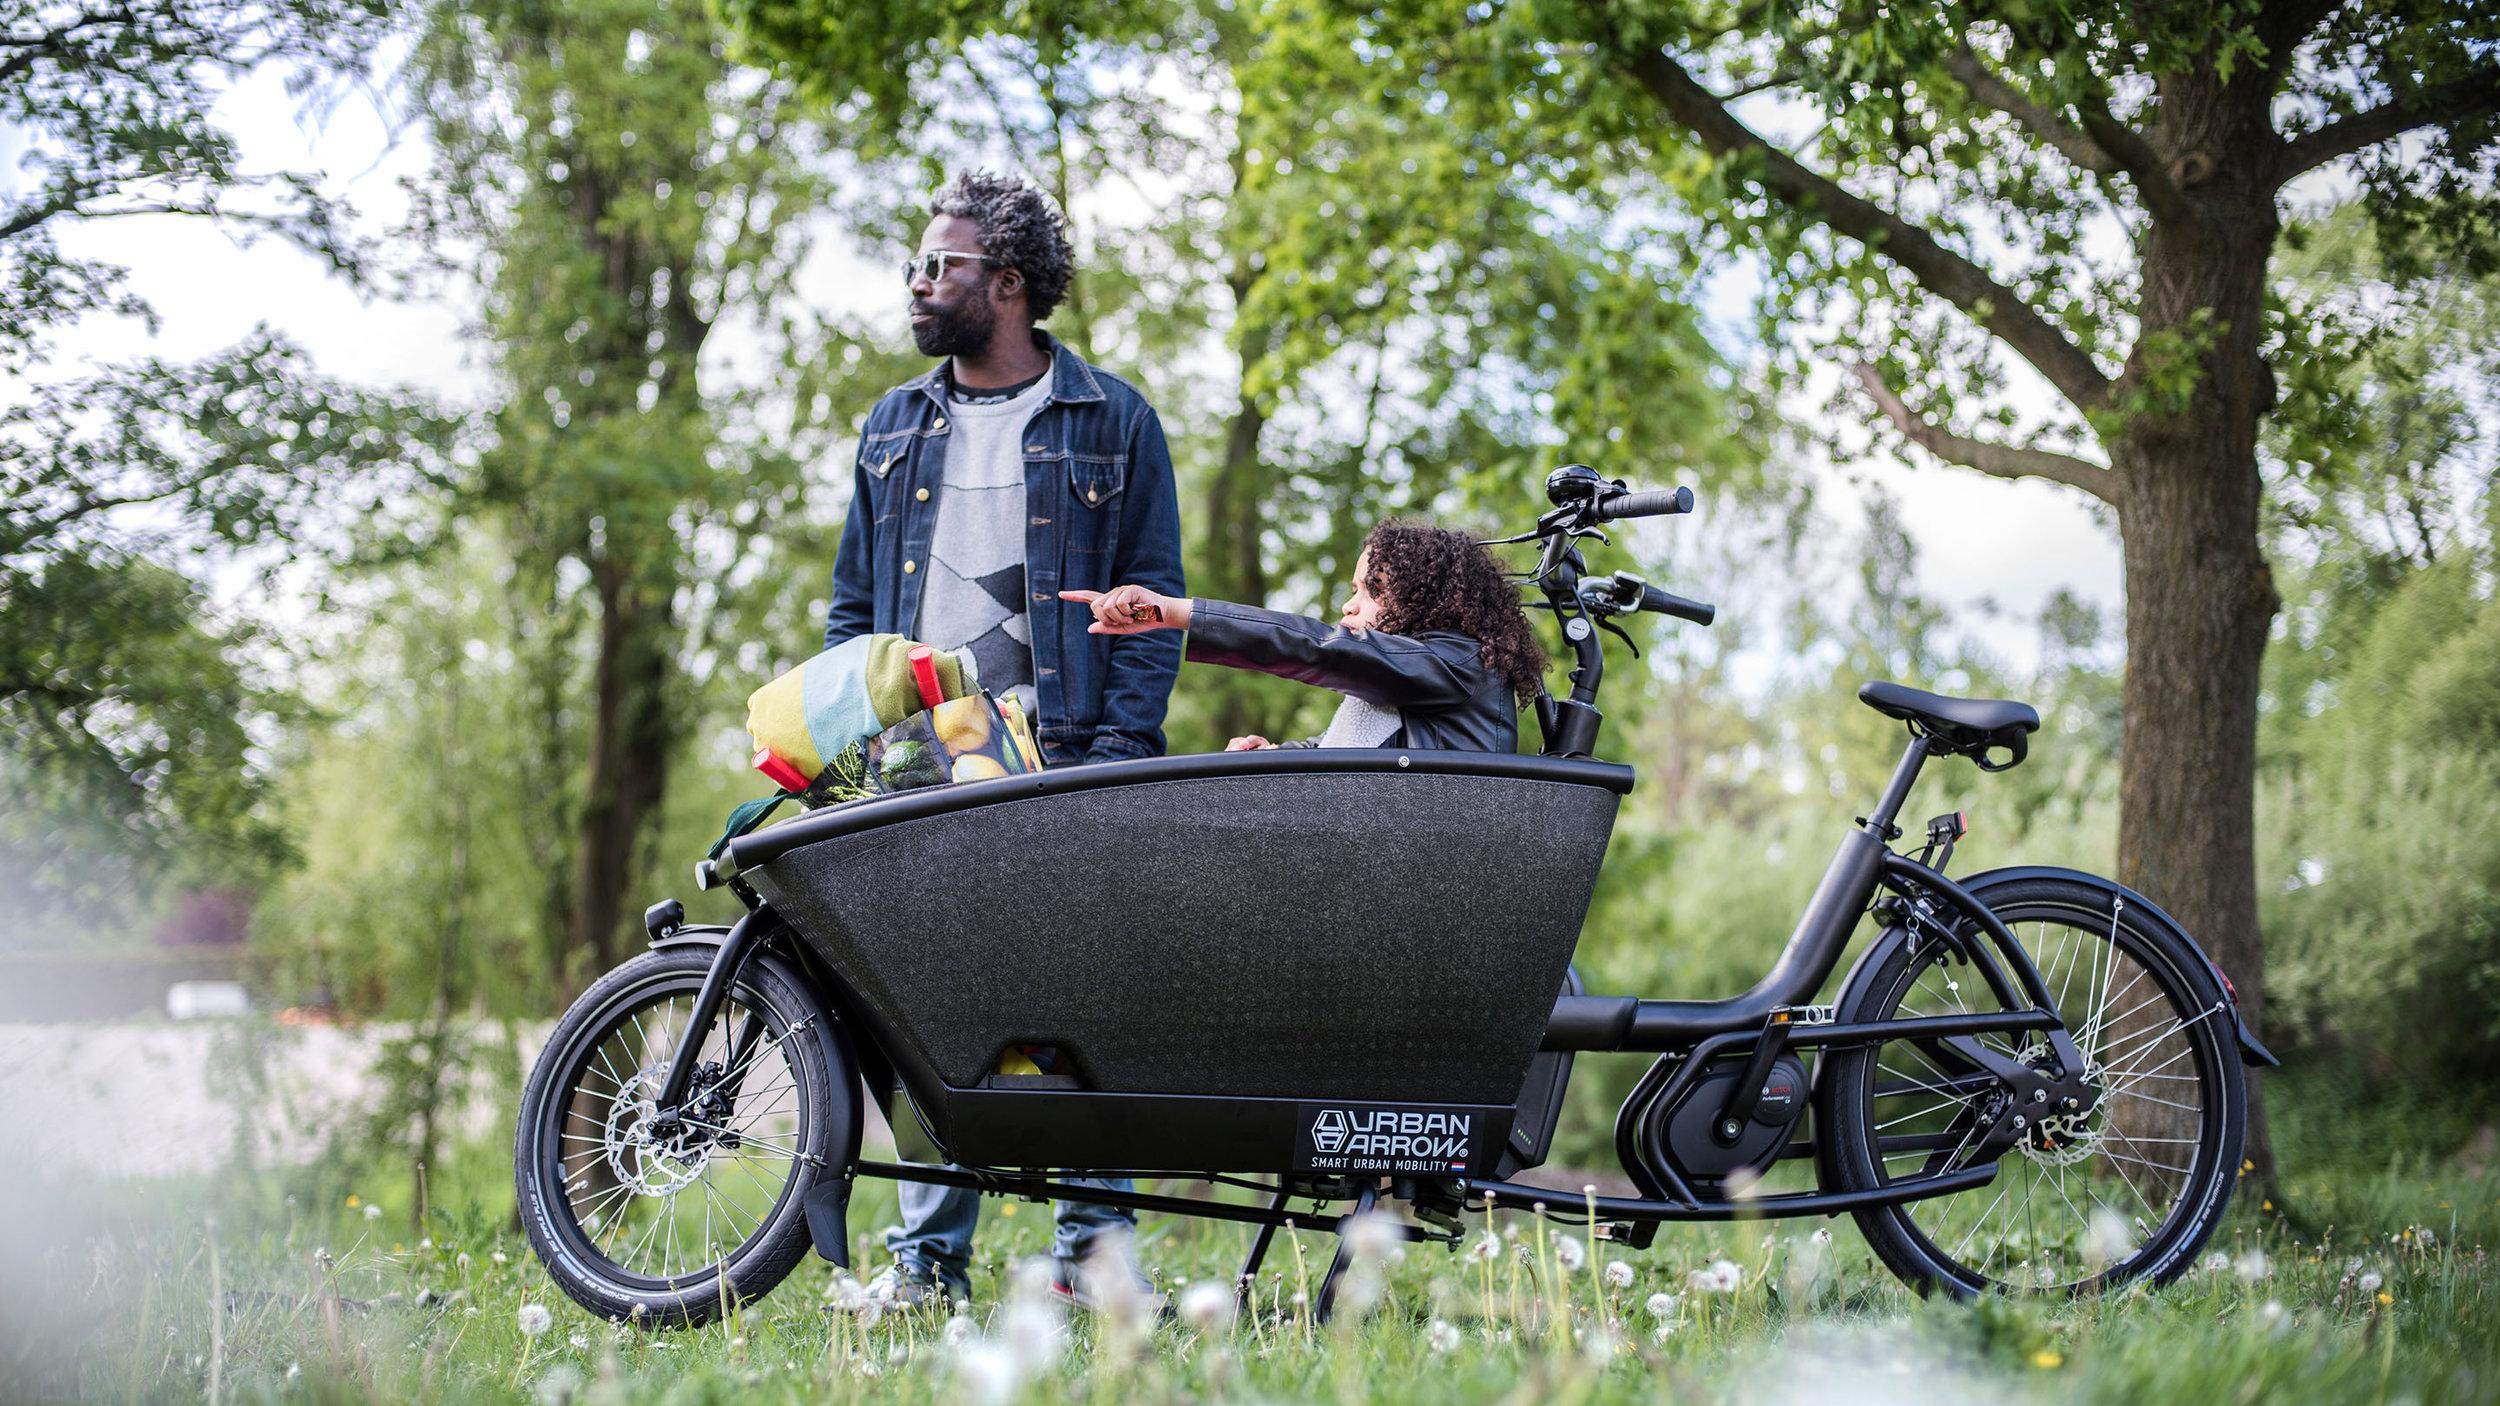 urban-arrow-family-cargo-electric-bike-seattle.jpg